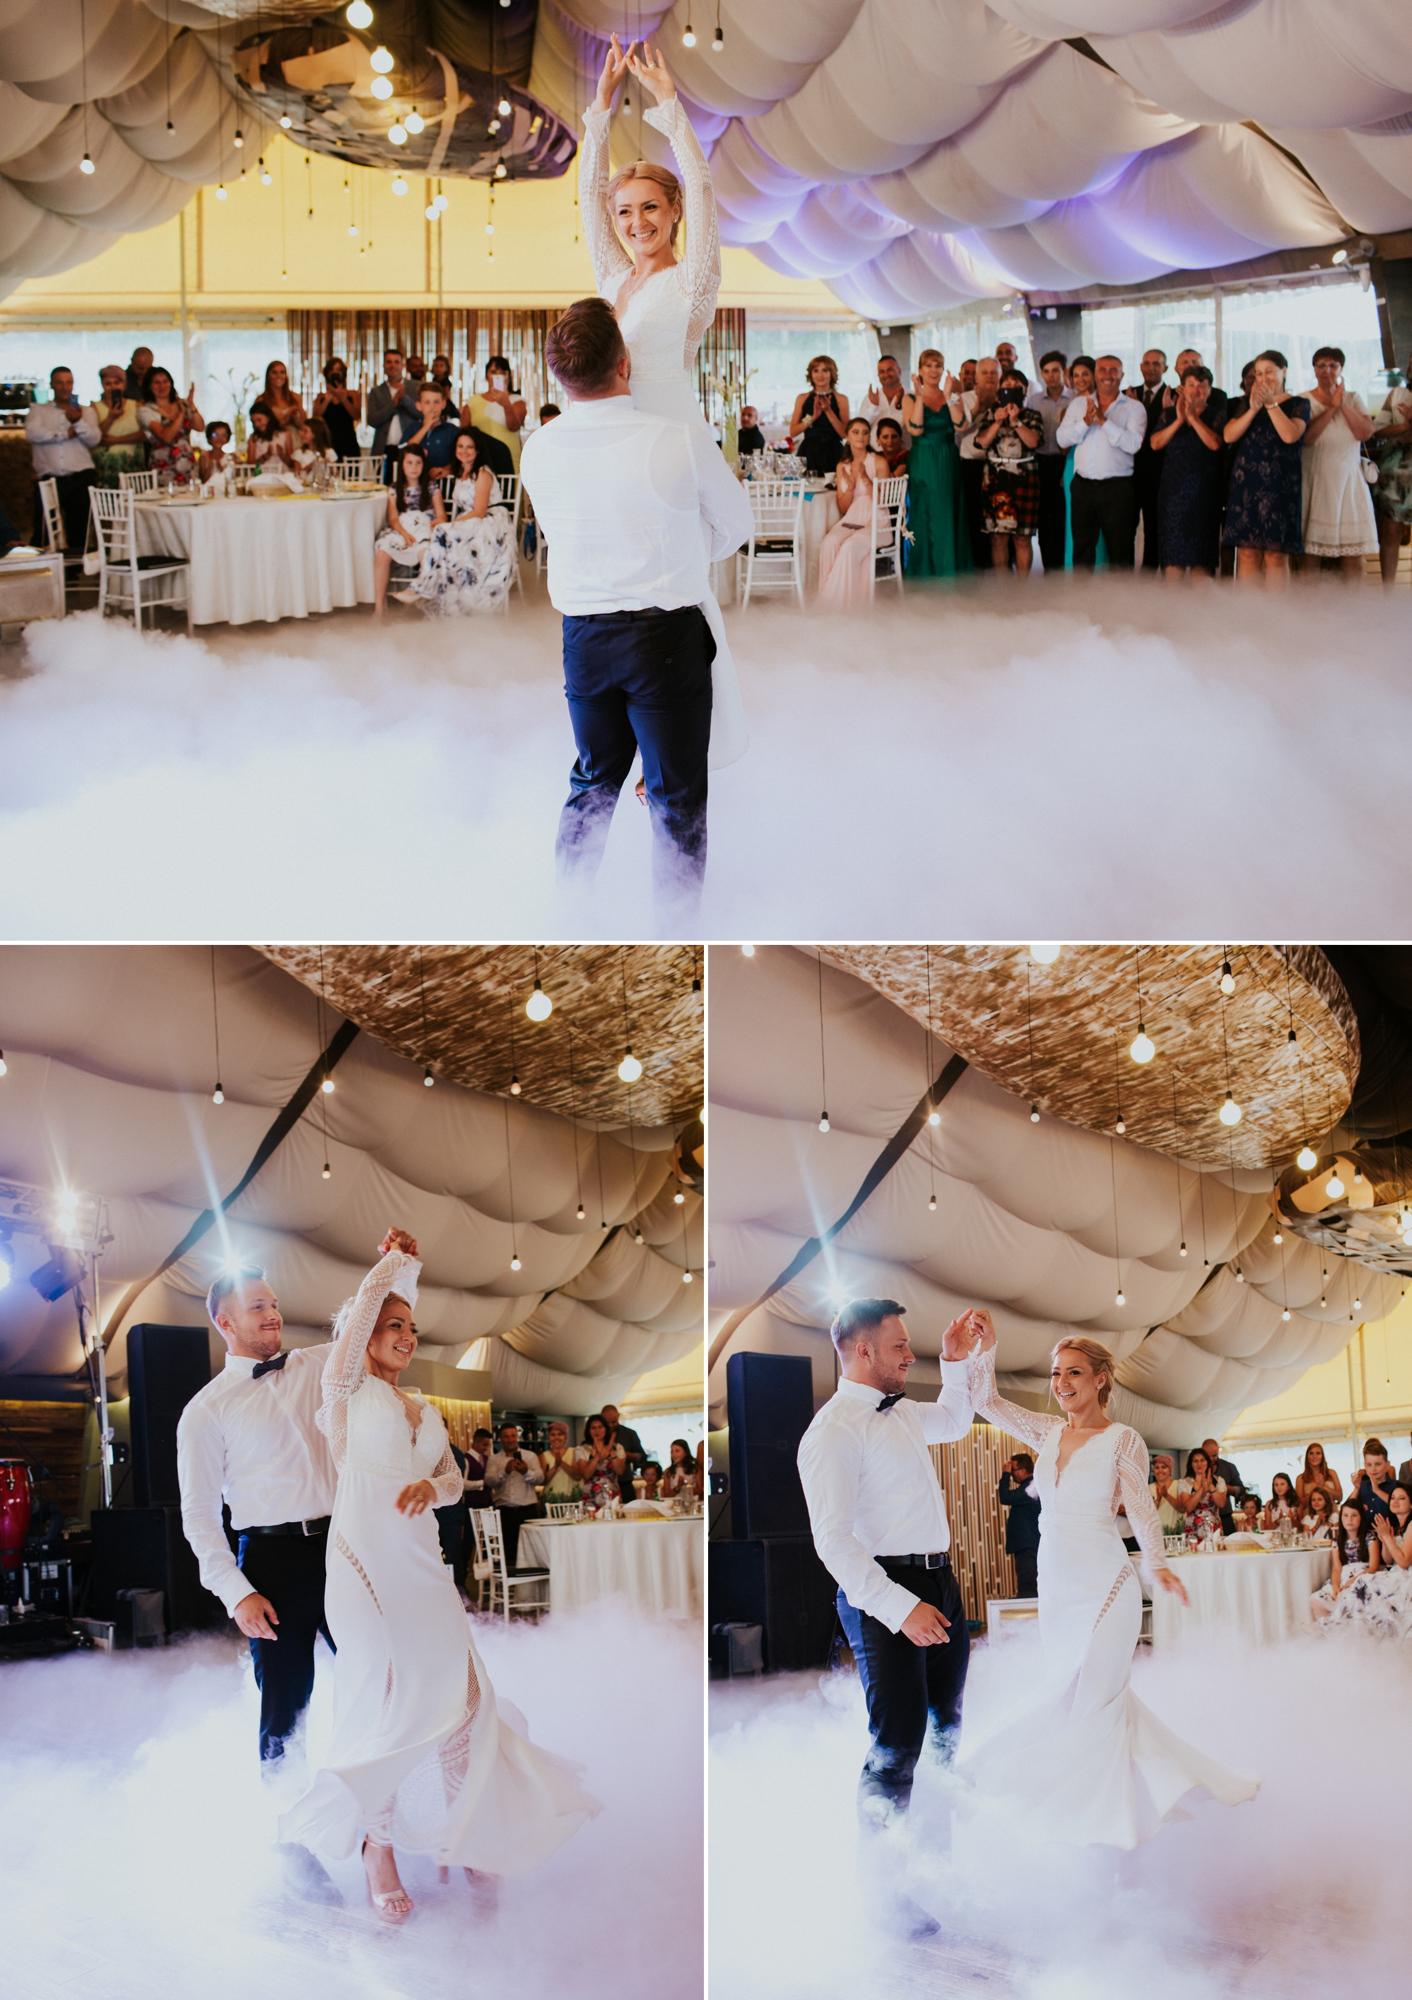 primul dans nunta, yaz harman, yaz brasov, fotograf evenimente brasov, fotograf profesionist Bucuresti